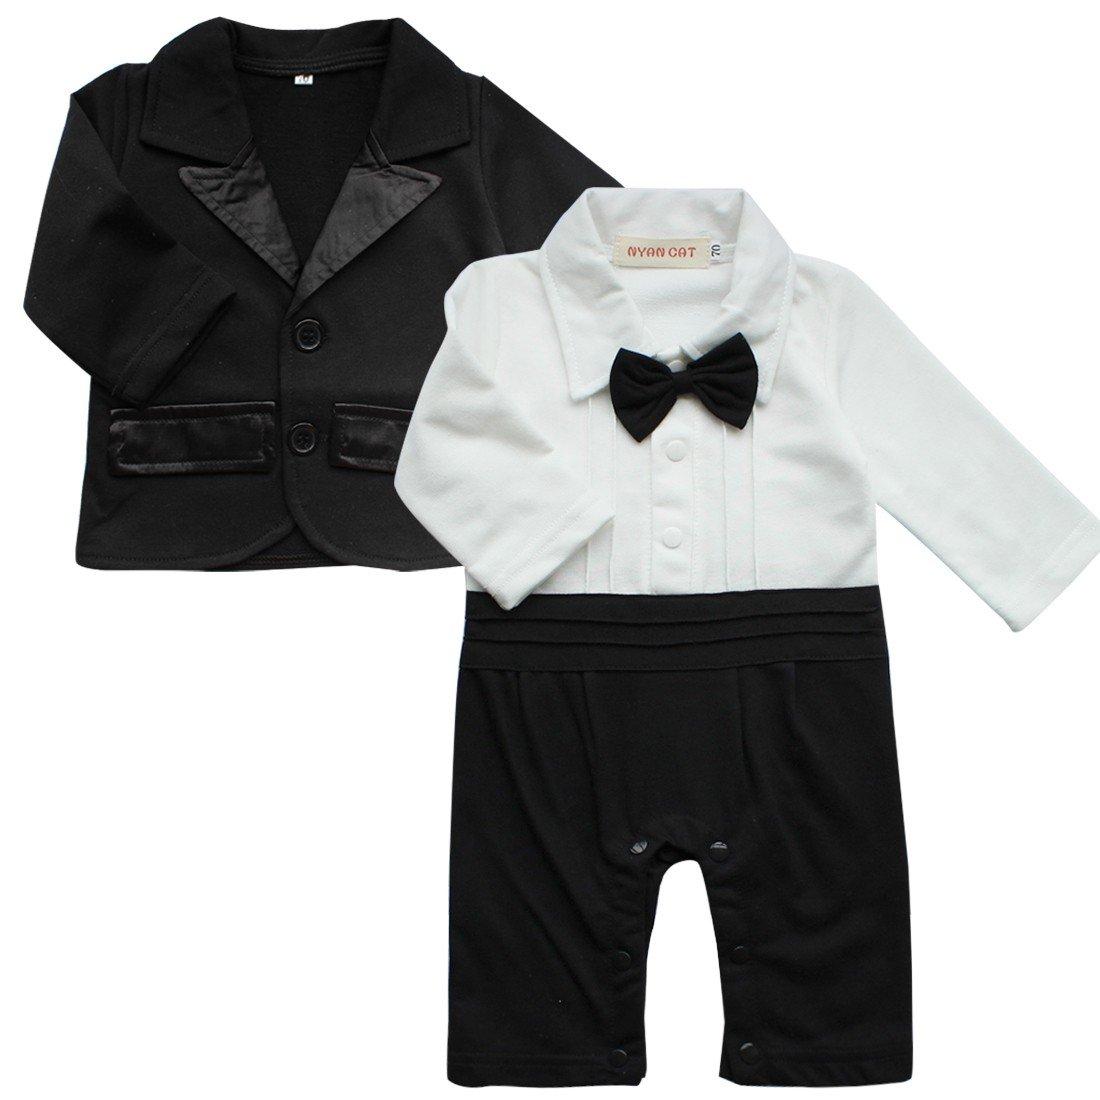 iEFiEL 2pcs Baby Boys Long Sleeve Tuxedo Wedding Romper and Jacket Black 3-6 Months